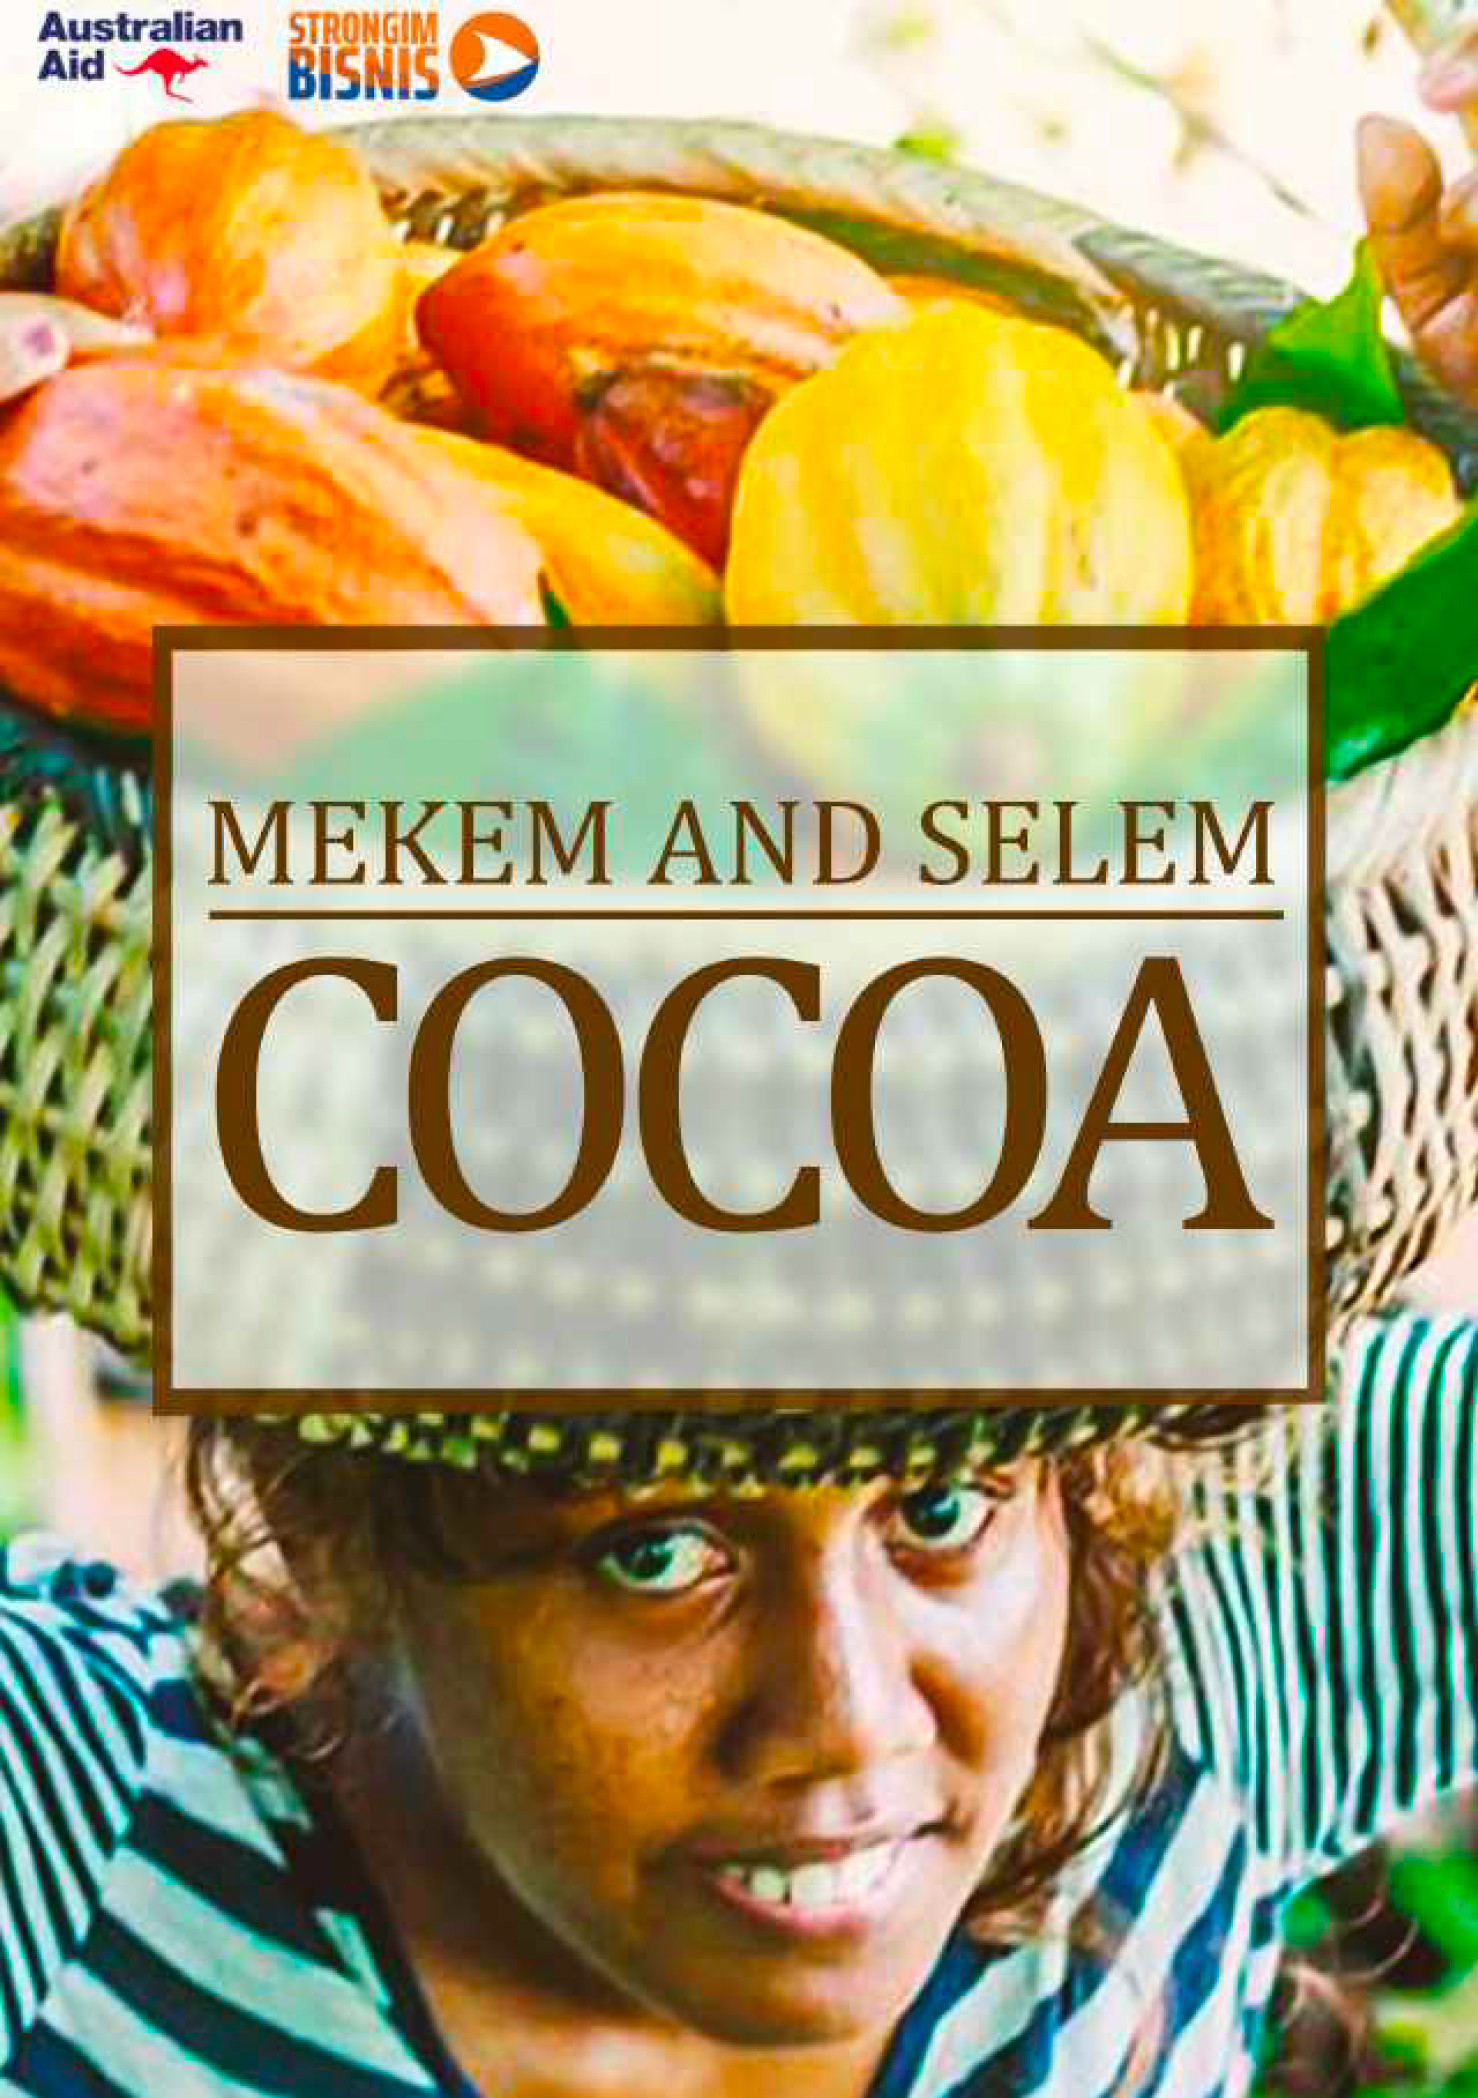 Mekim and Selem Cocoa Strongim Bisnis 2020